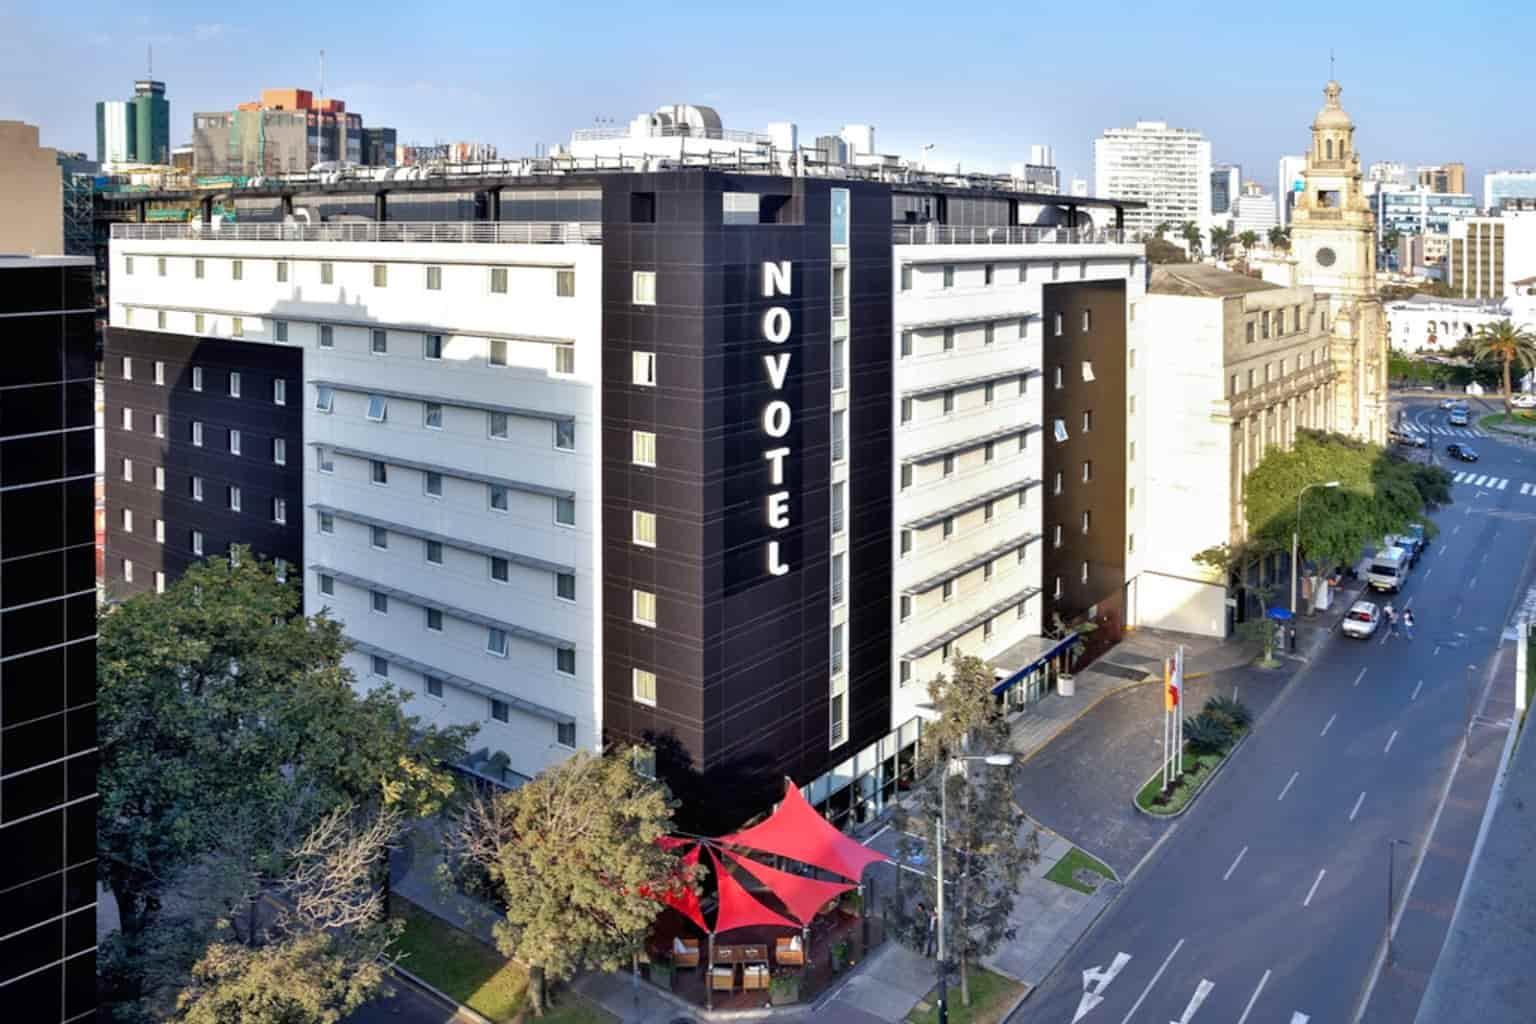 Hotel Accor Novotel Lima